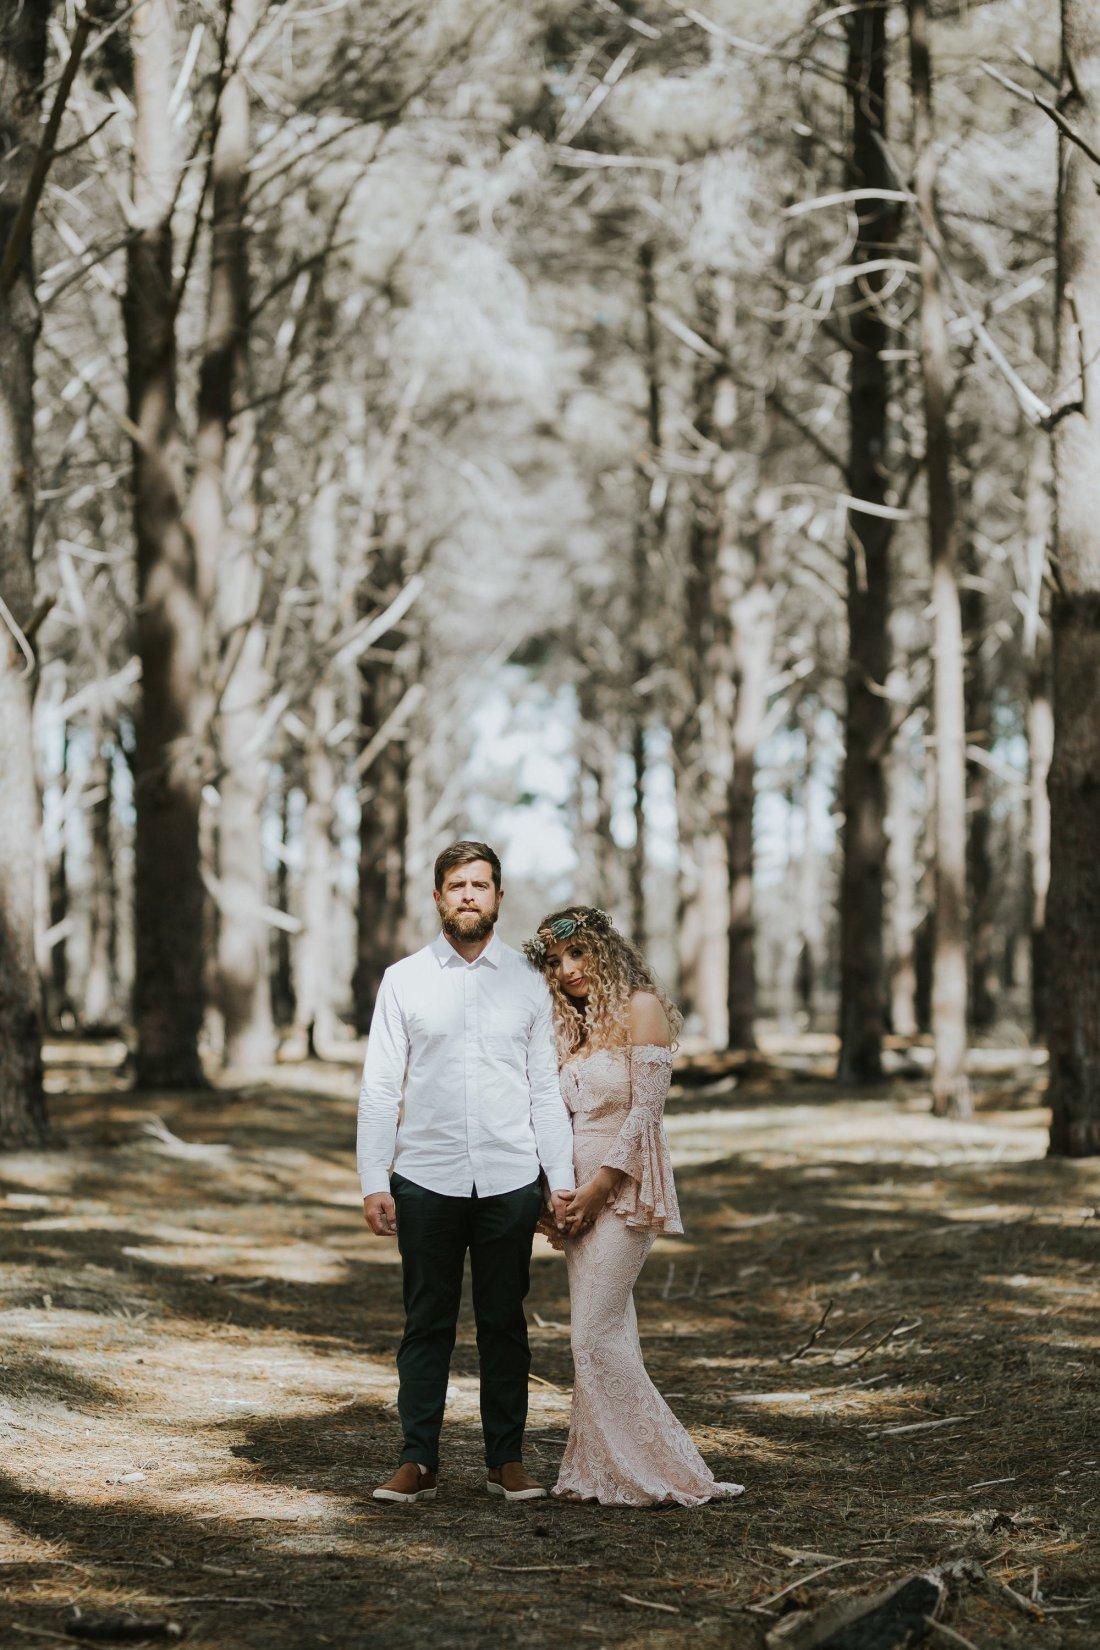 Sinéad + Shane | Pines Forrest Elopement | Ebony Blush Photography | Perth Wedding Photographer64